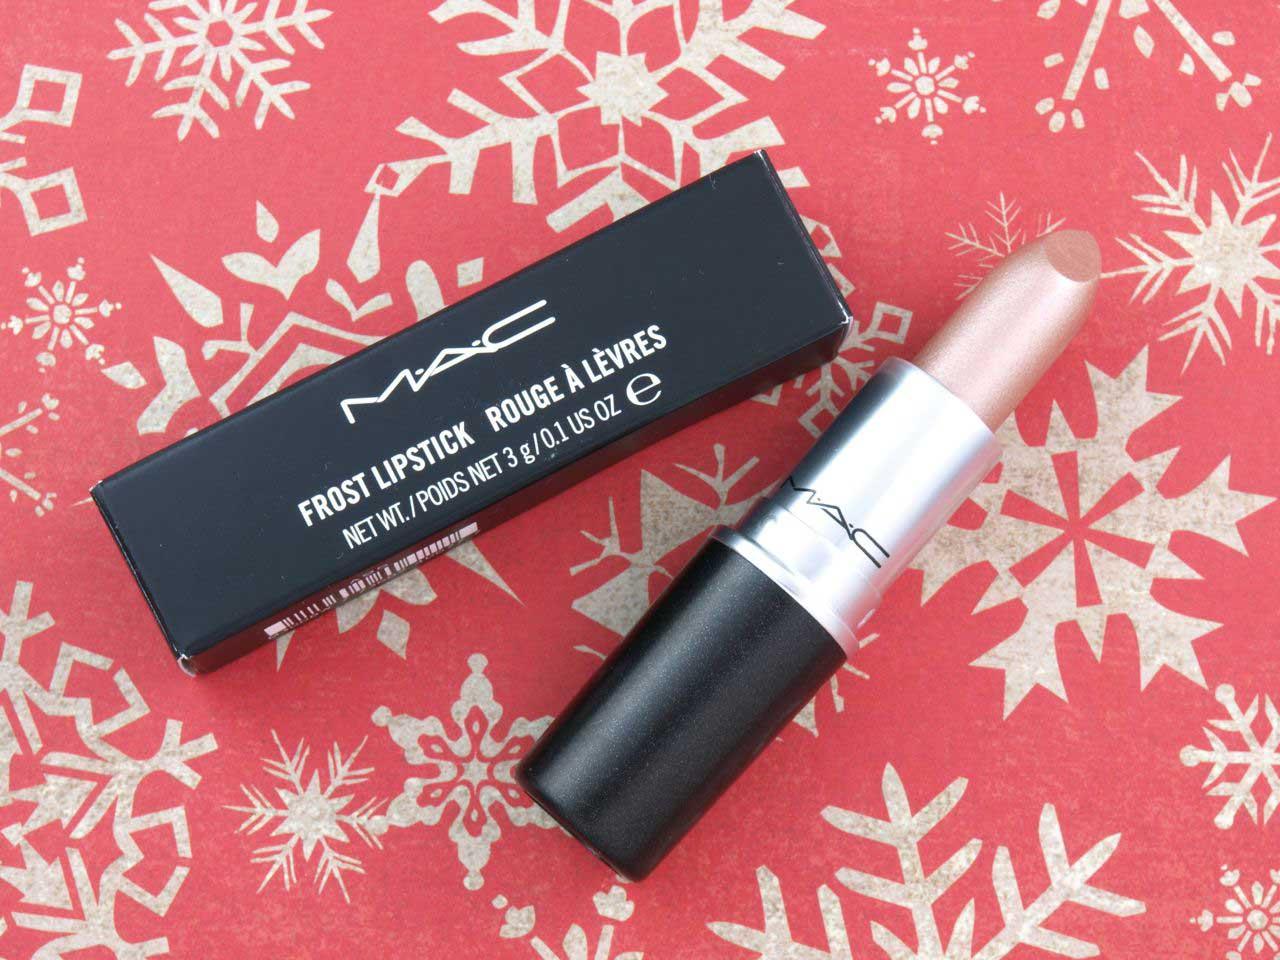 jenis macam lipstik bibir wanita beauty blogger vlogger fashion warna kosmetik makeup